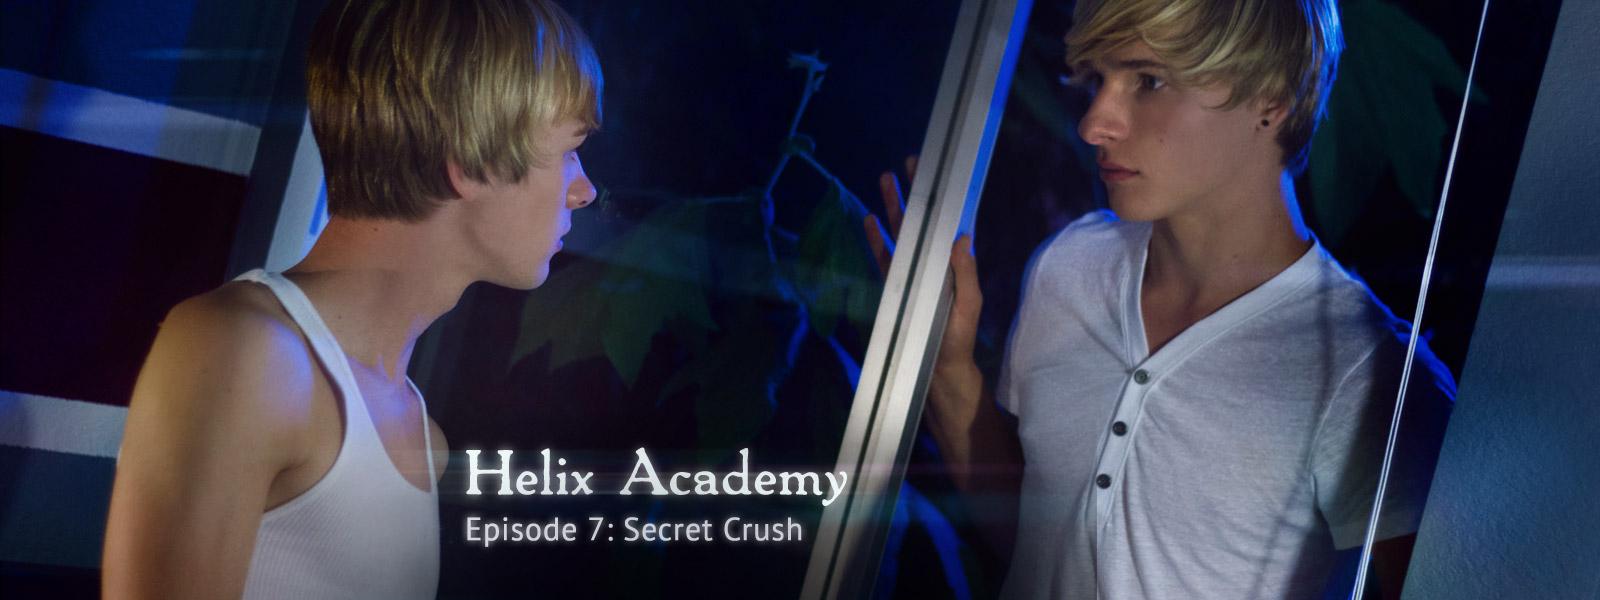 Helix Academy 2 | Episode 7: Secret Crush